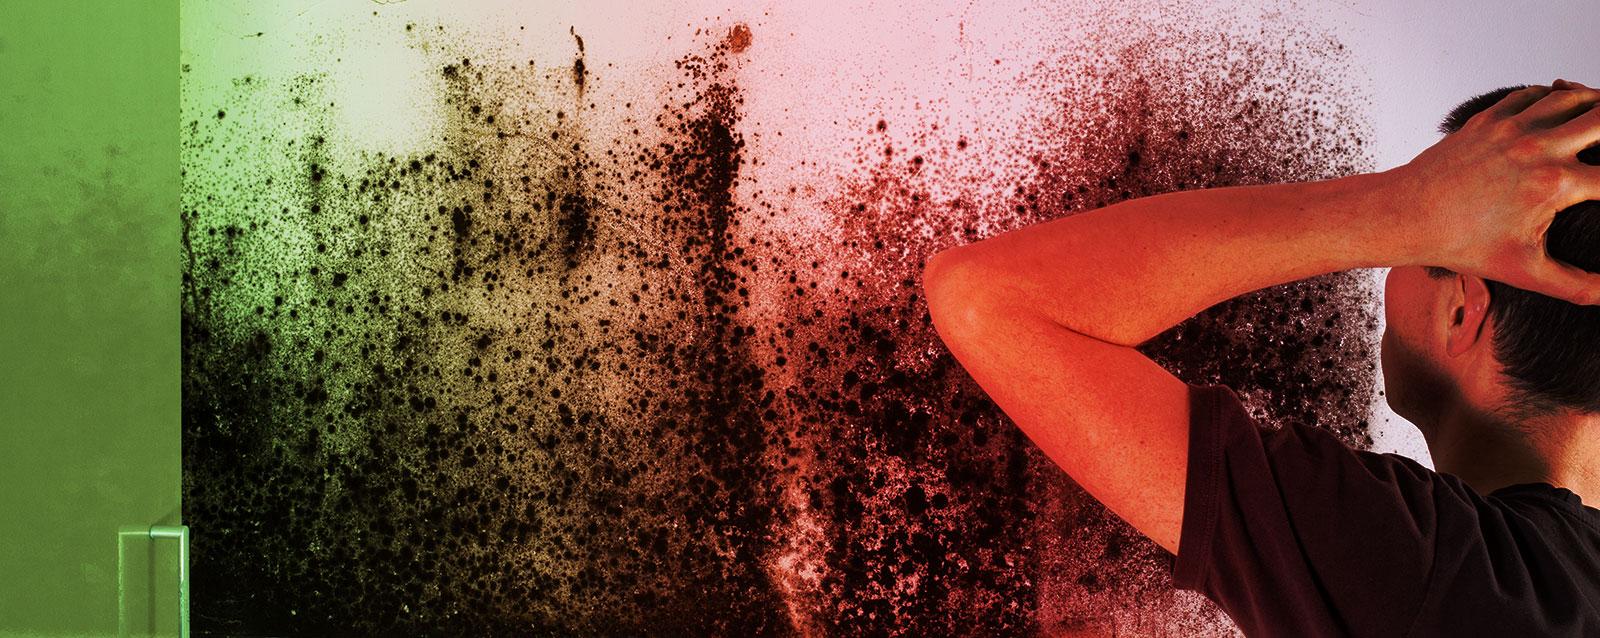 Mold Eradicator | Mold Abatement | Mold Removal | Richton Park, IL